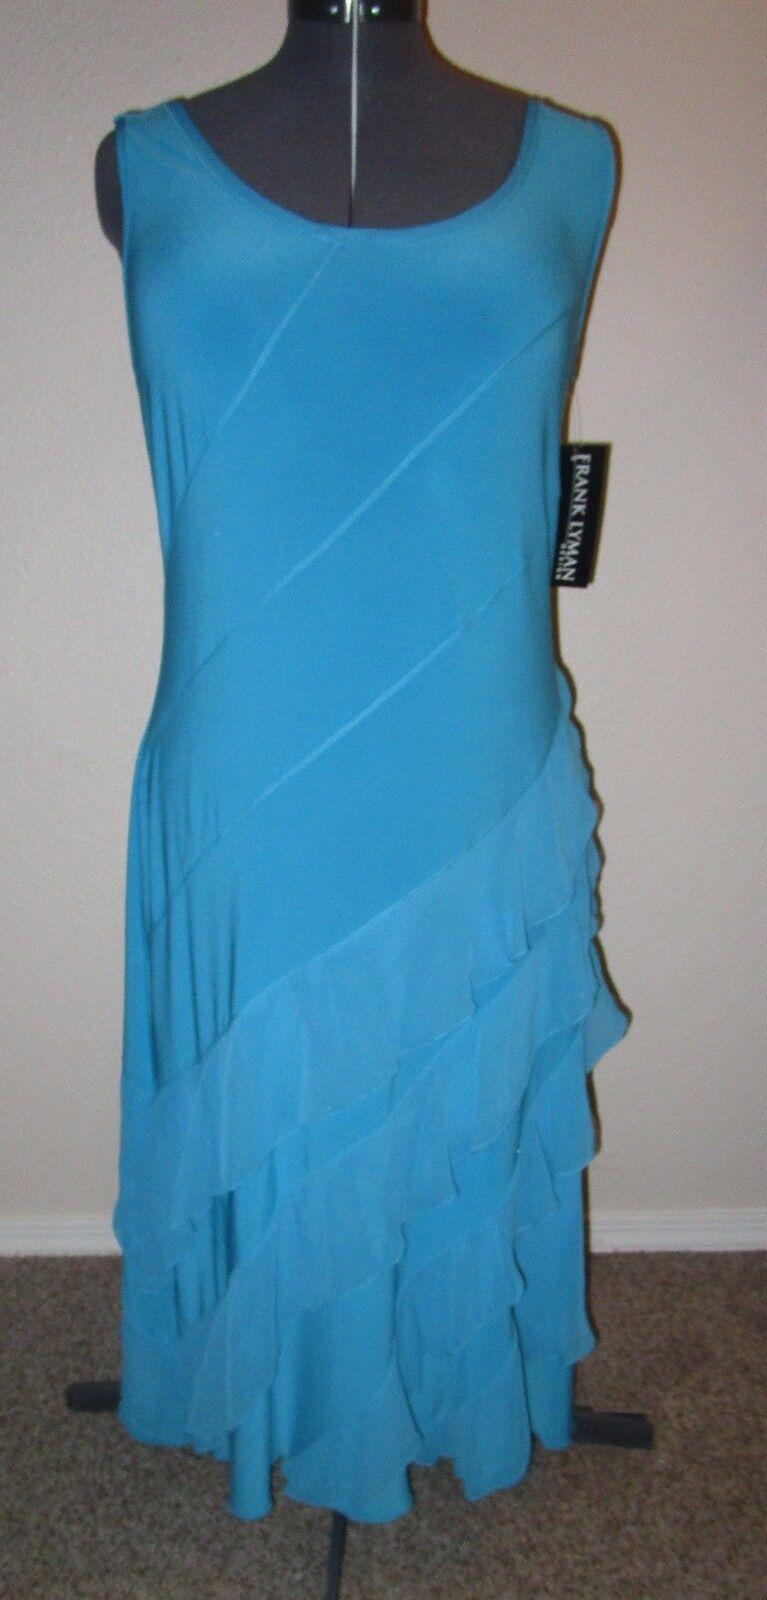 FRANK LYMAN NEW Turquoise Ruffled Sleeveless Dress damen Größe 16 US 18 UK NWT